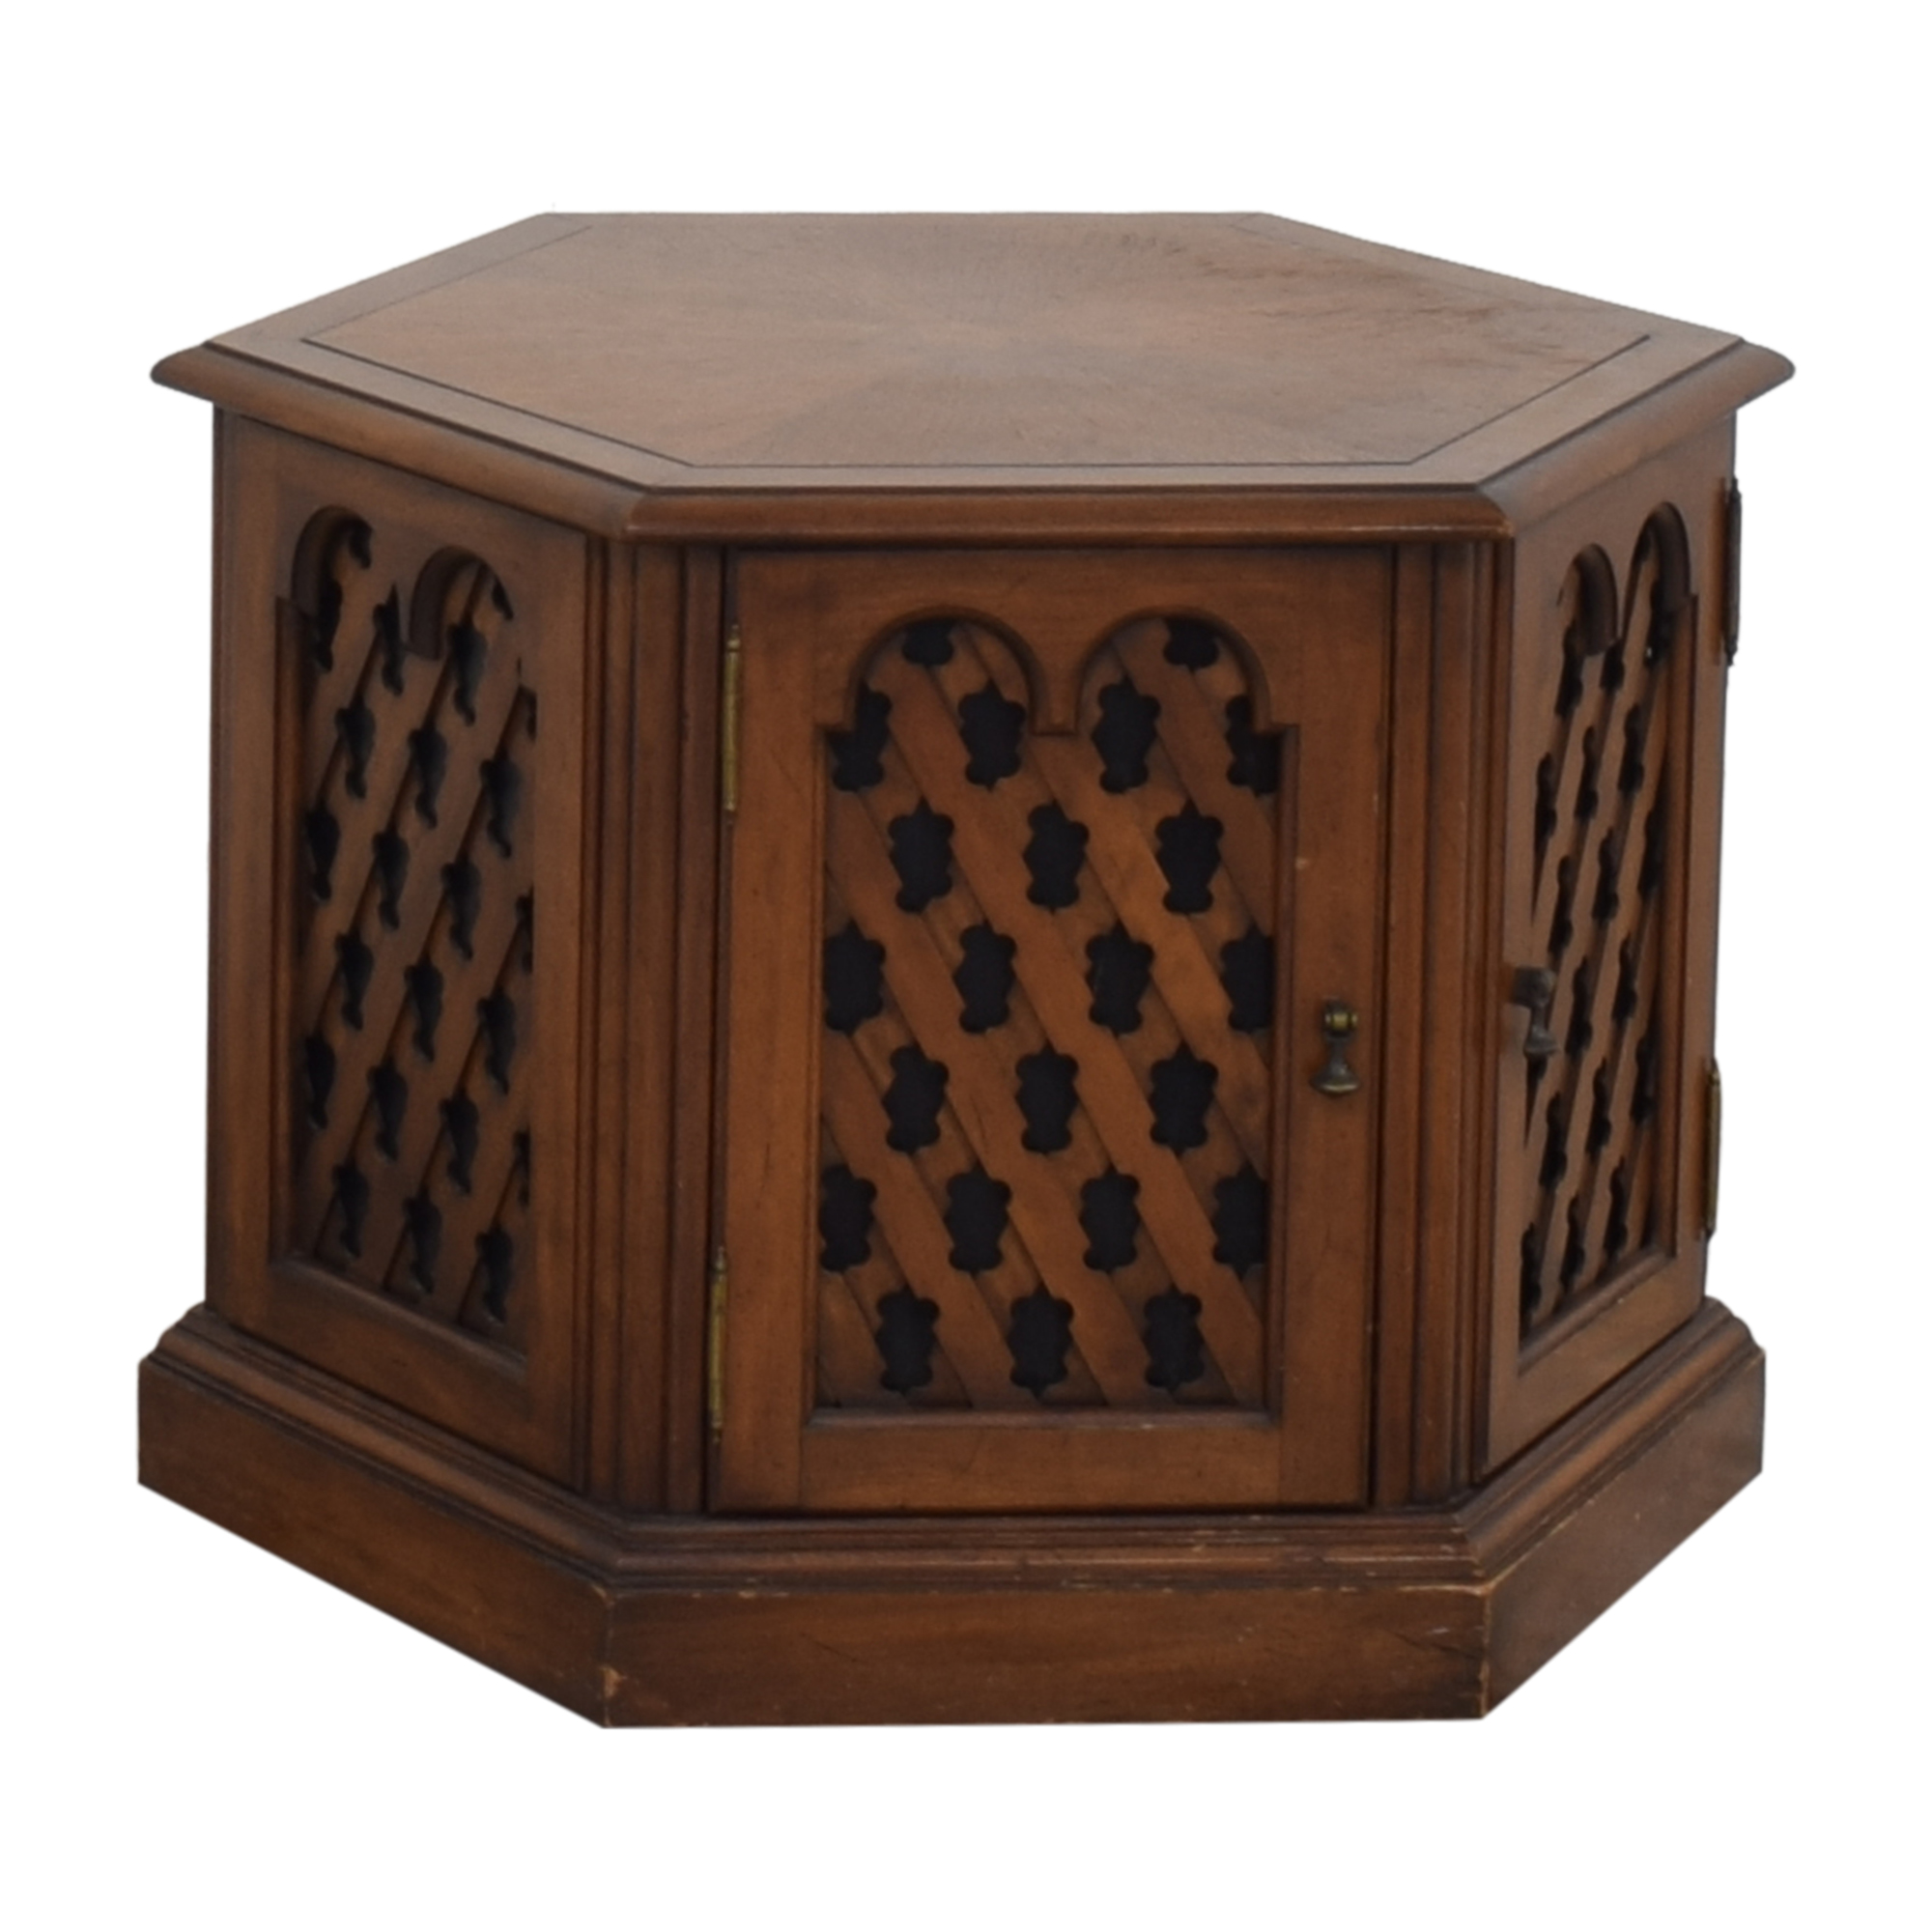 Drexel Drexel Hexagon Side Table End Tables